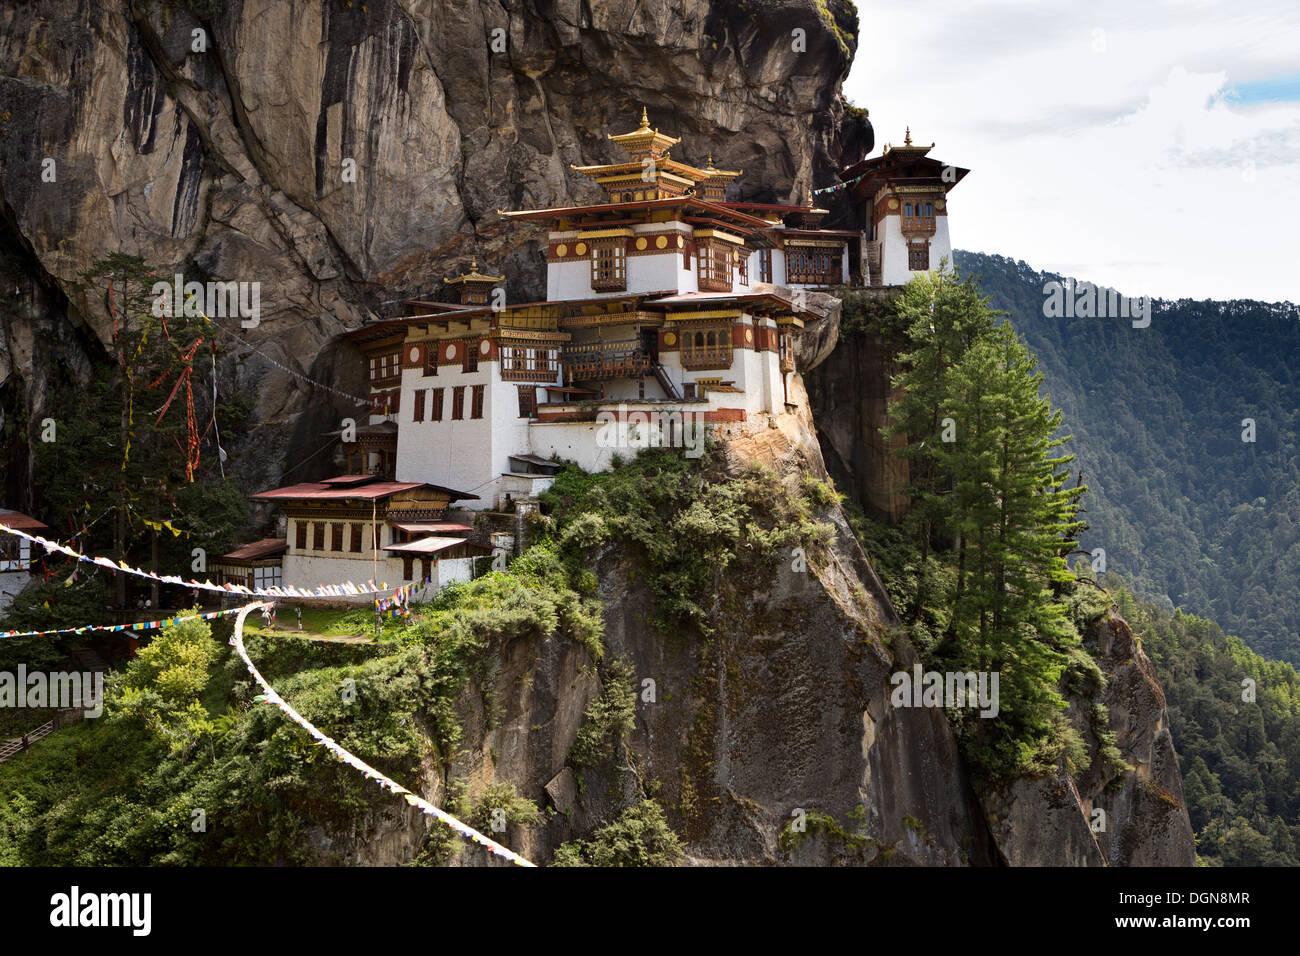 Bhutan, Paro valley, Taktsang Lhakang (Tiger's Nest) monastery clinging to cliffside Stock Photo